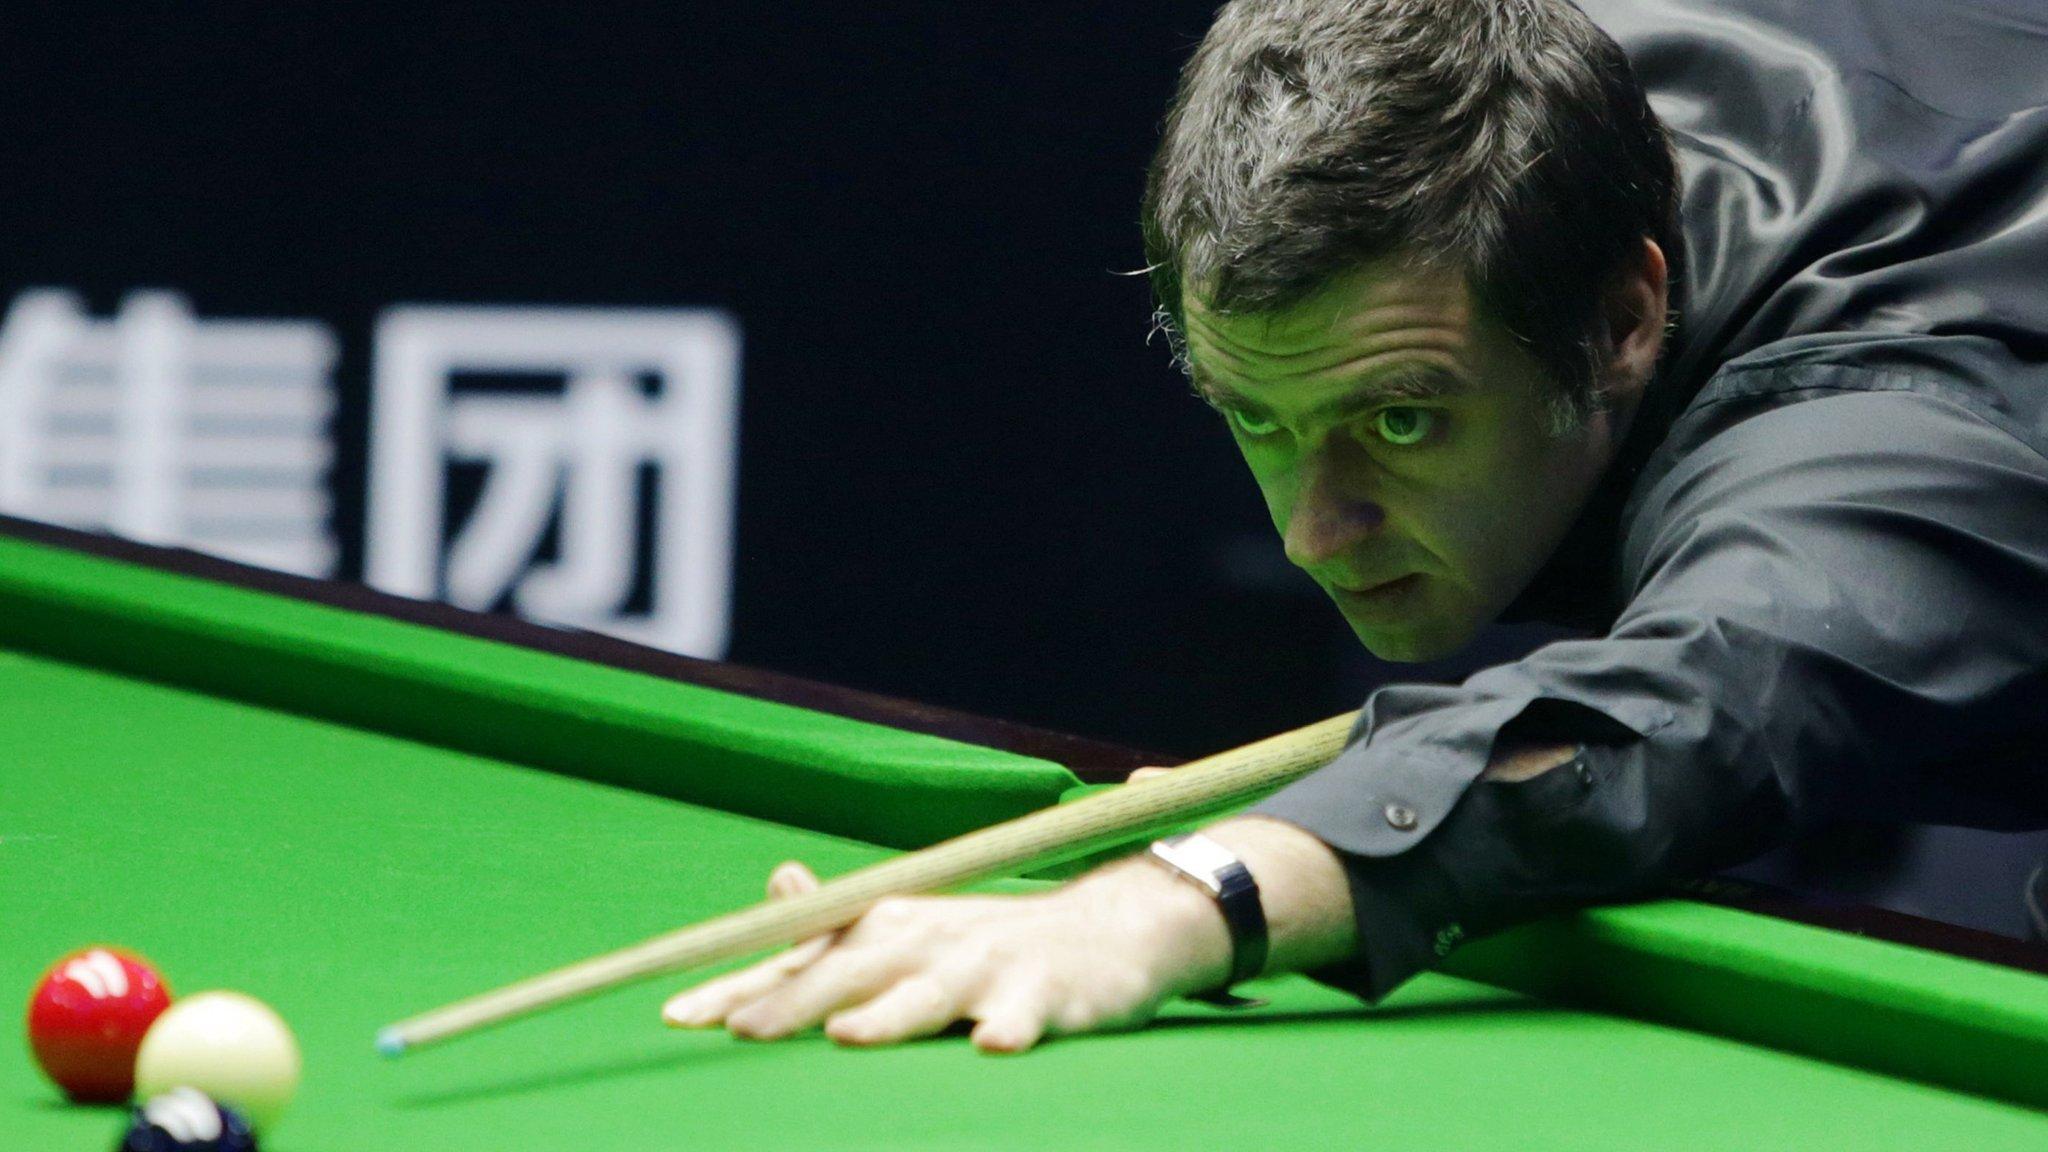 English Open: Ronnie O'Sullivan beats teenager Luo Honghao to make semi-final